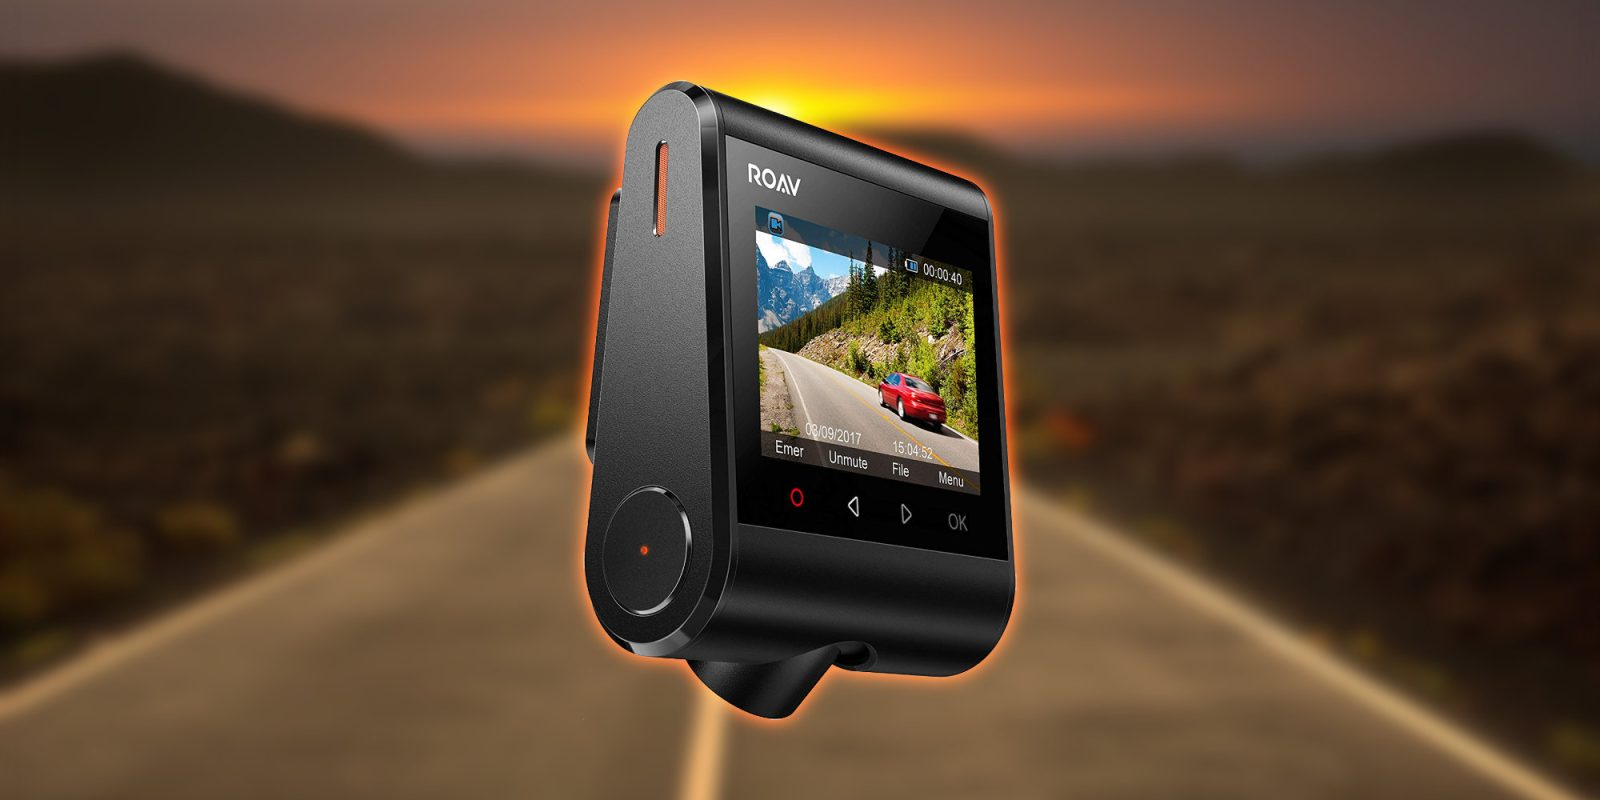 Prove what happened using Anker's Roav C1 Dash Cam: $49 (Save 33%)